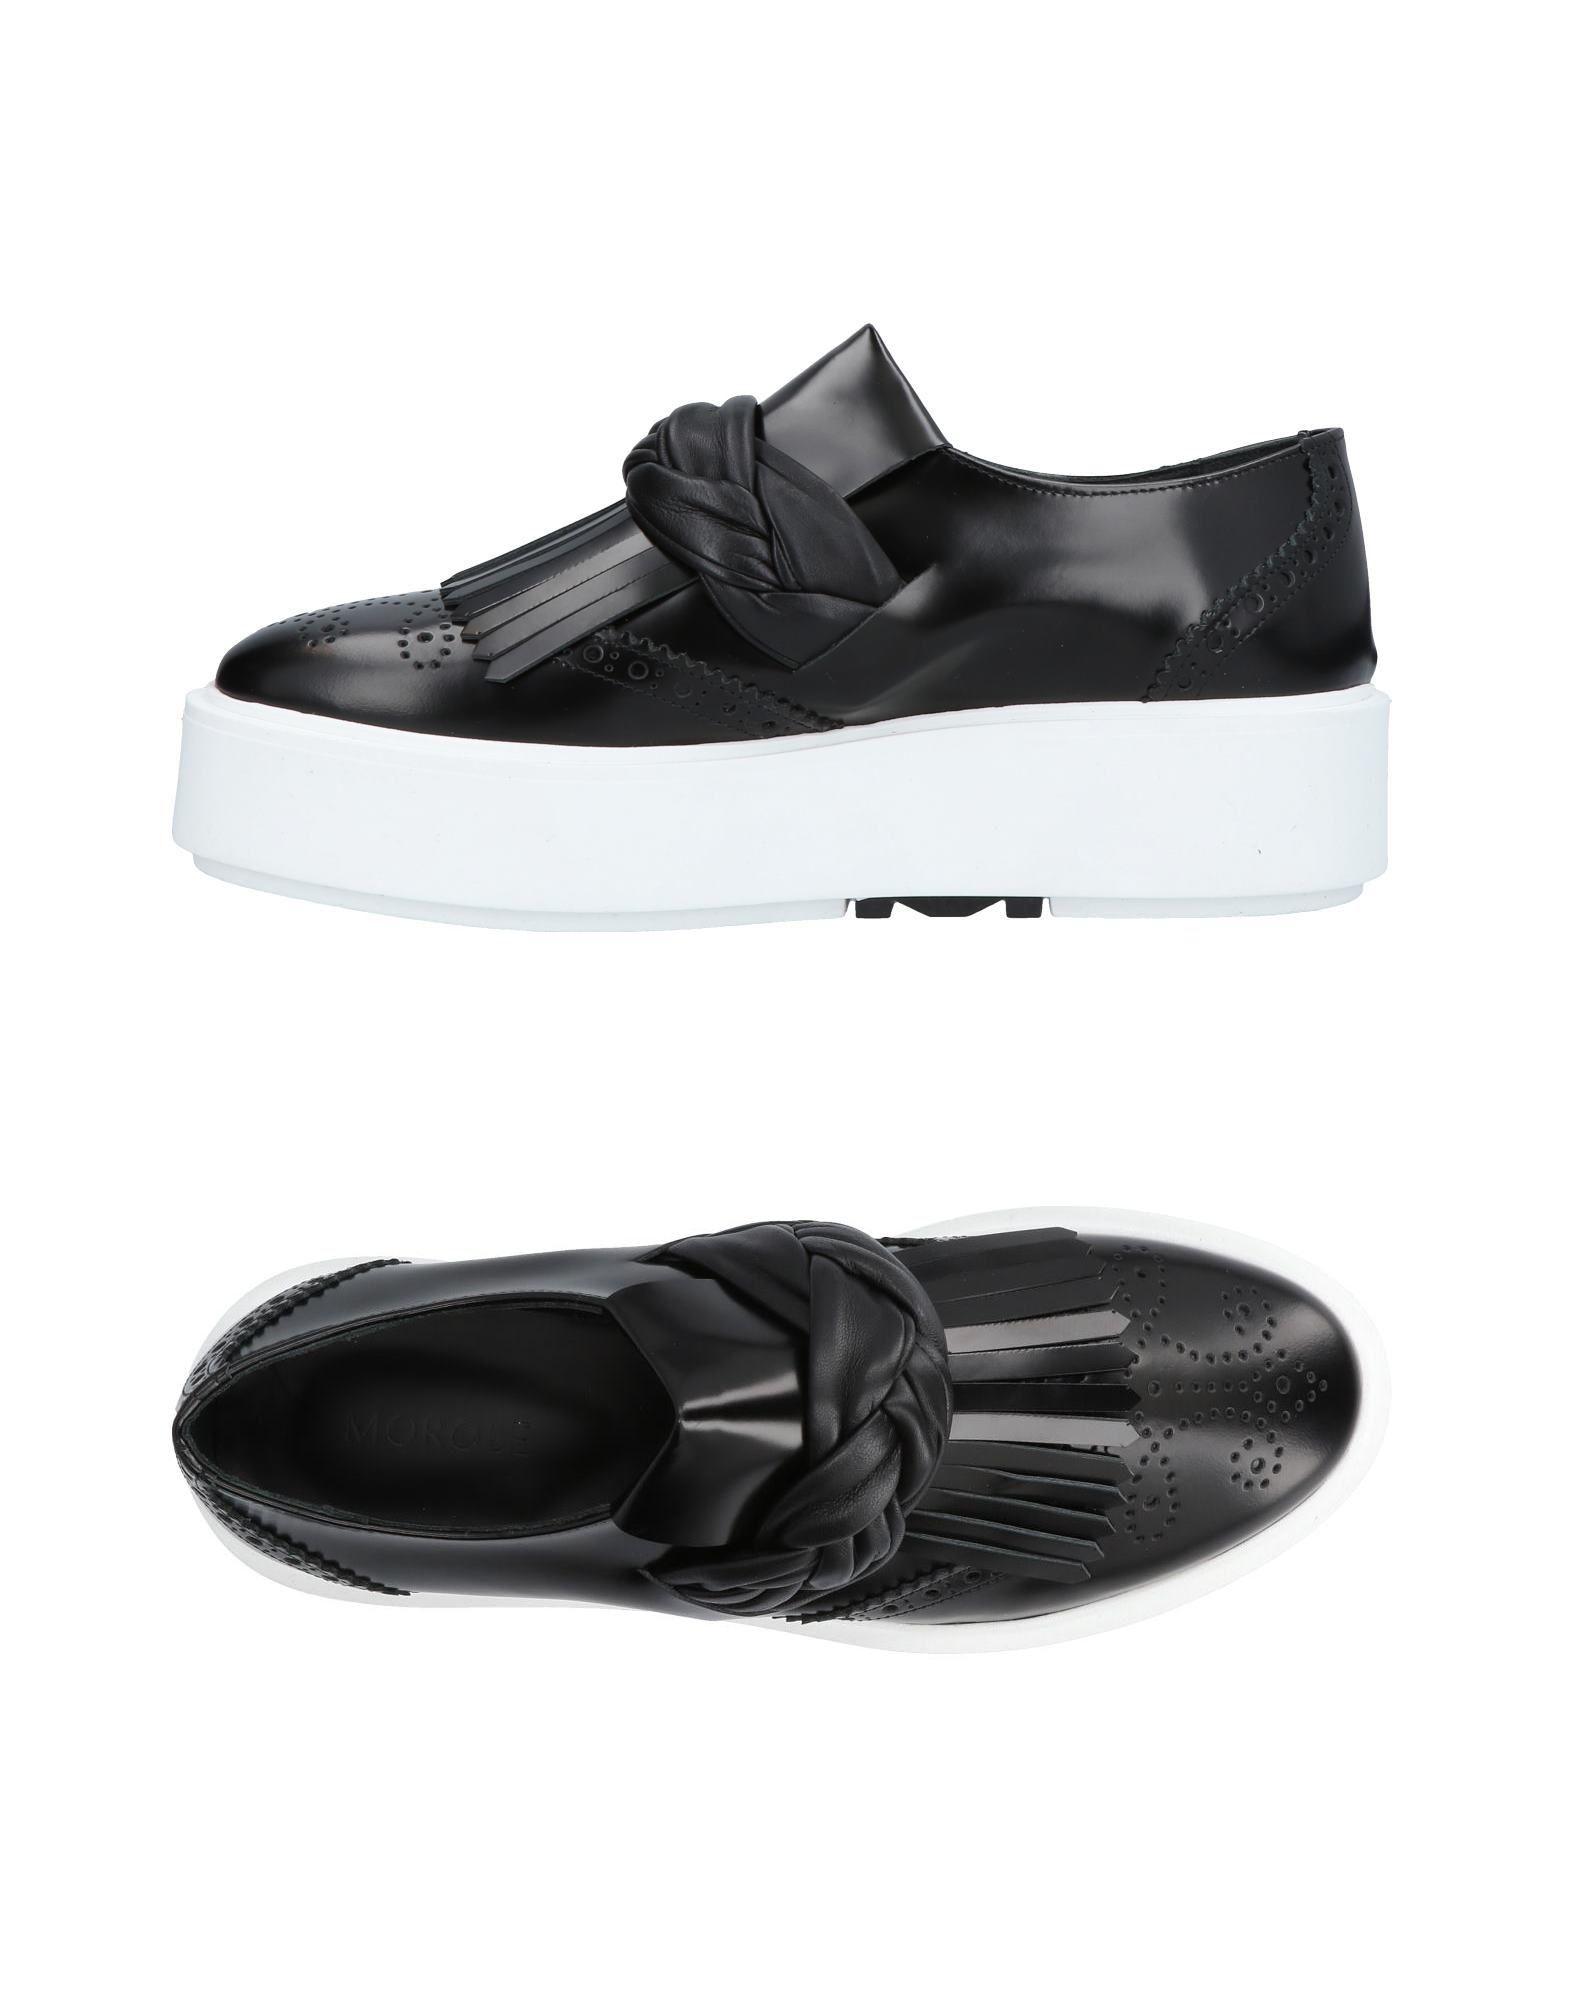 Morobē Mokassins Damen  11450448BR Gute Qualität beliebte Schuhe